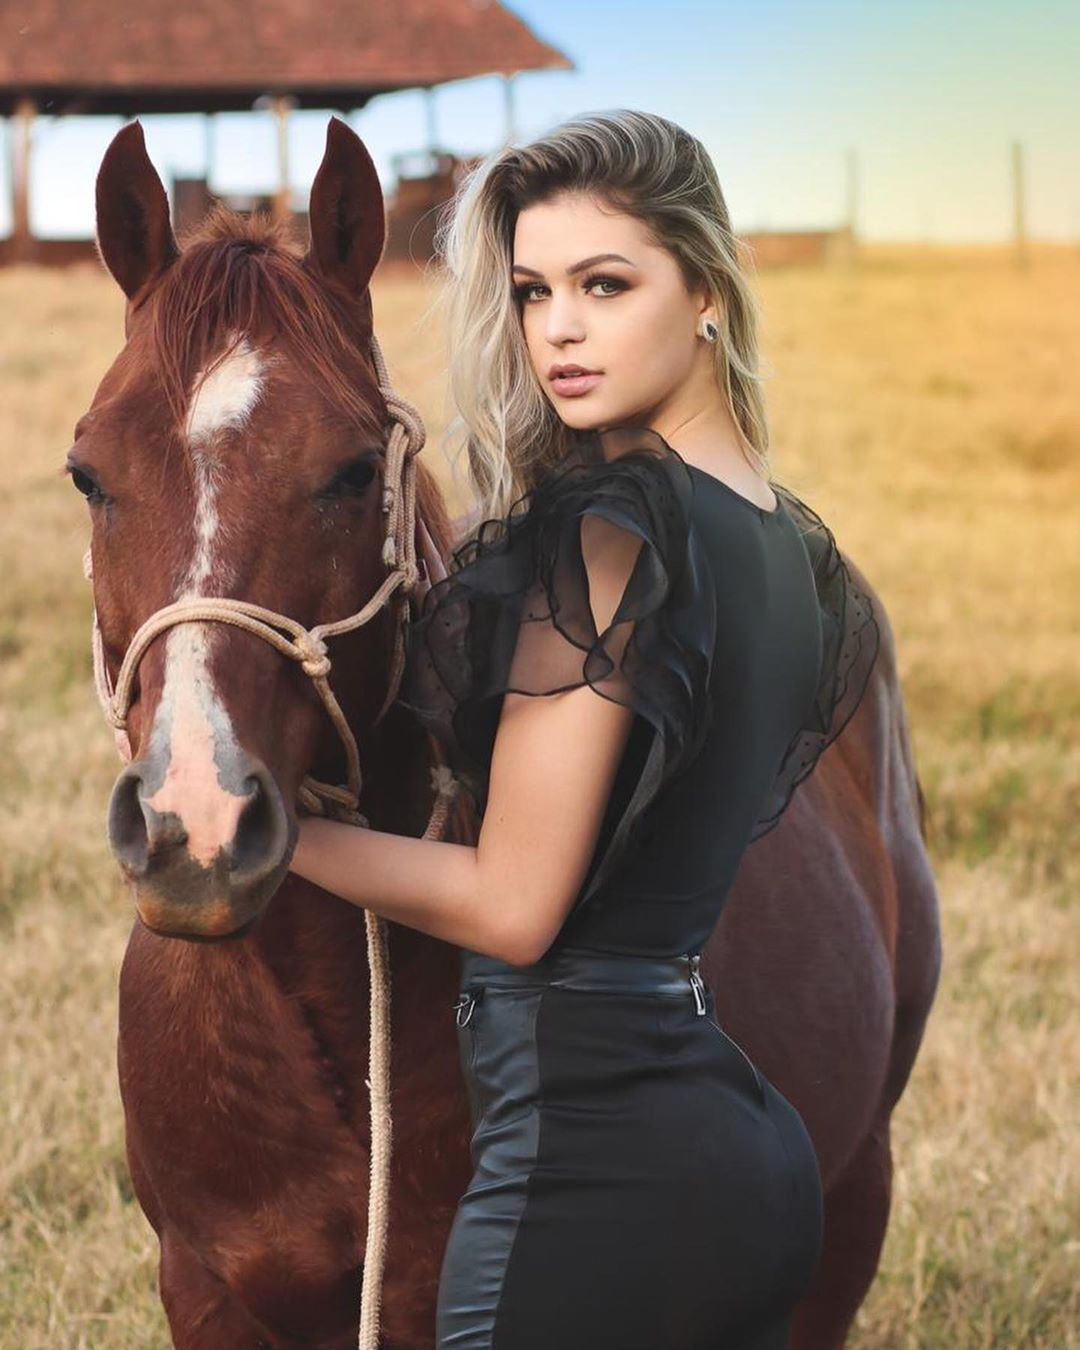 maria gabriela batistela, miss brasil terra 2019. 69063710